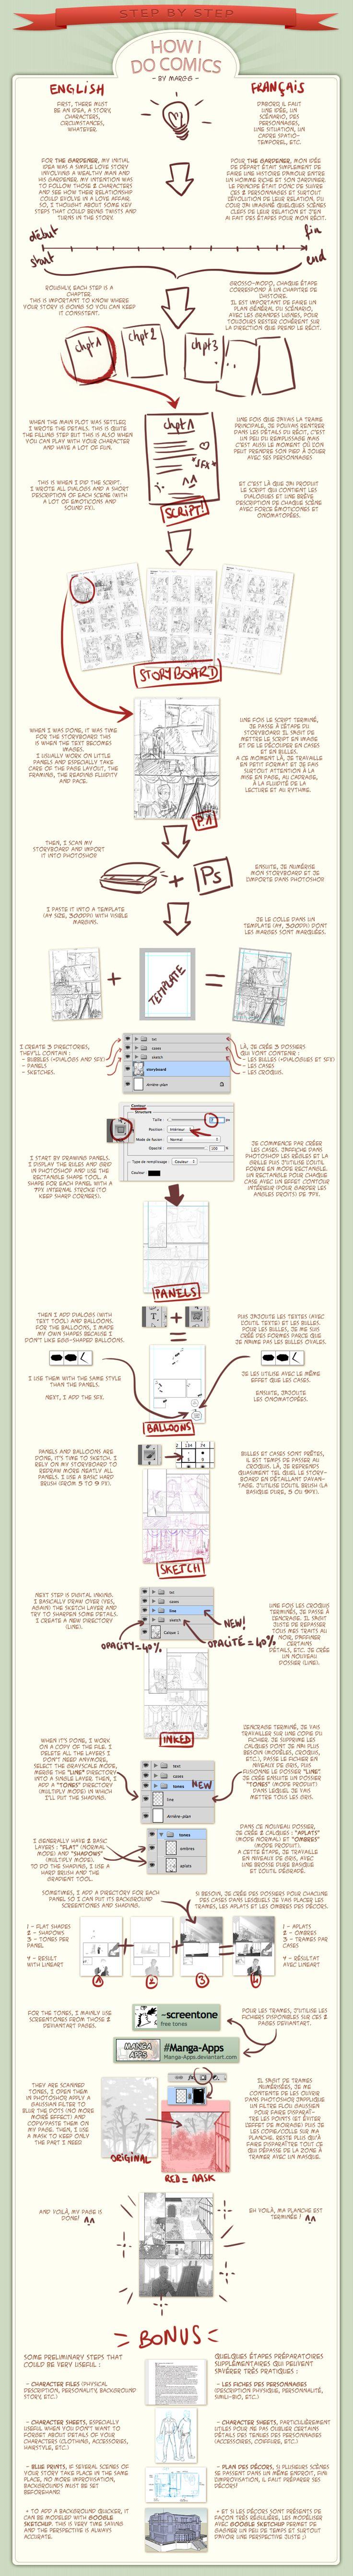 """How I do comics"" by Marc G on DeviantArt. #comics #process"